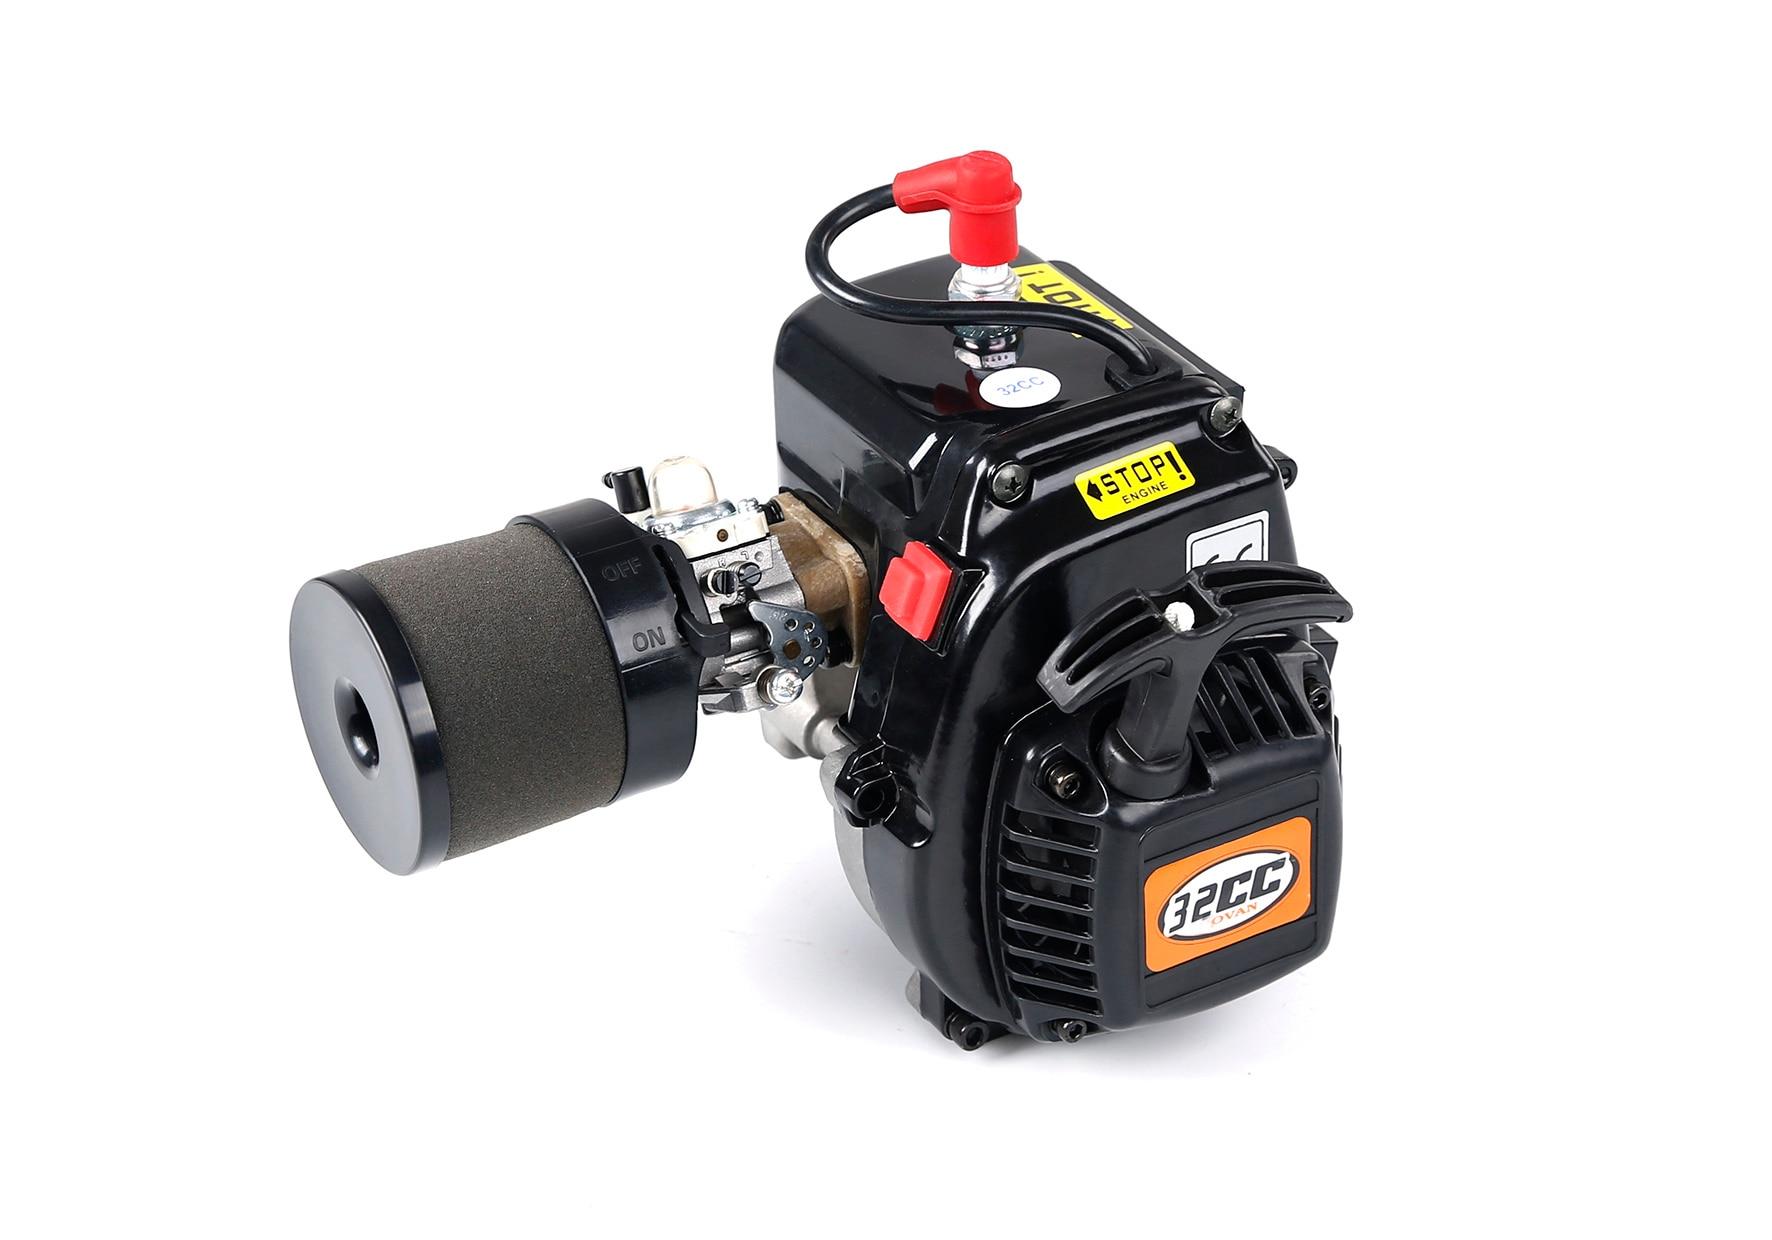 32CC 4 Bolts Easy Start Engine (with Walbro813 Carburetor NGK Spark Plug) Fit for 1/5 HPI ROVAN ROFUN KM BAJA Losi Rc Car Parts